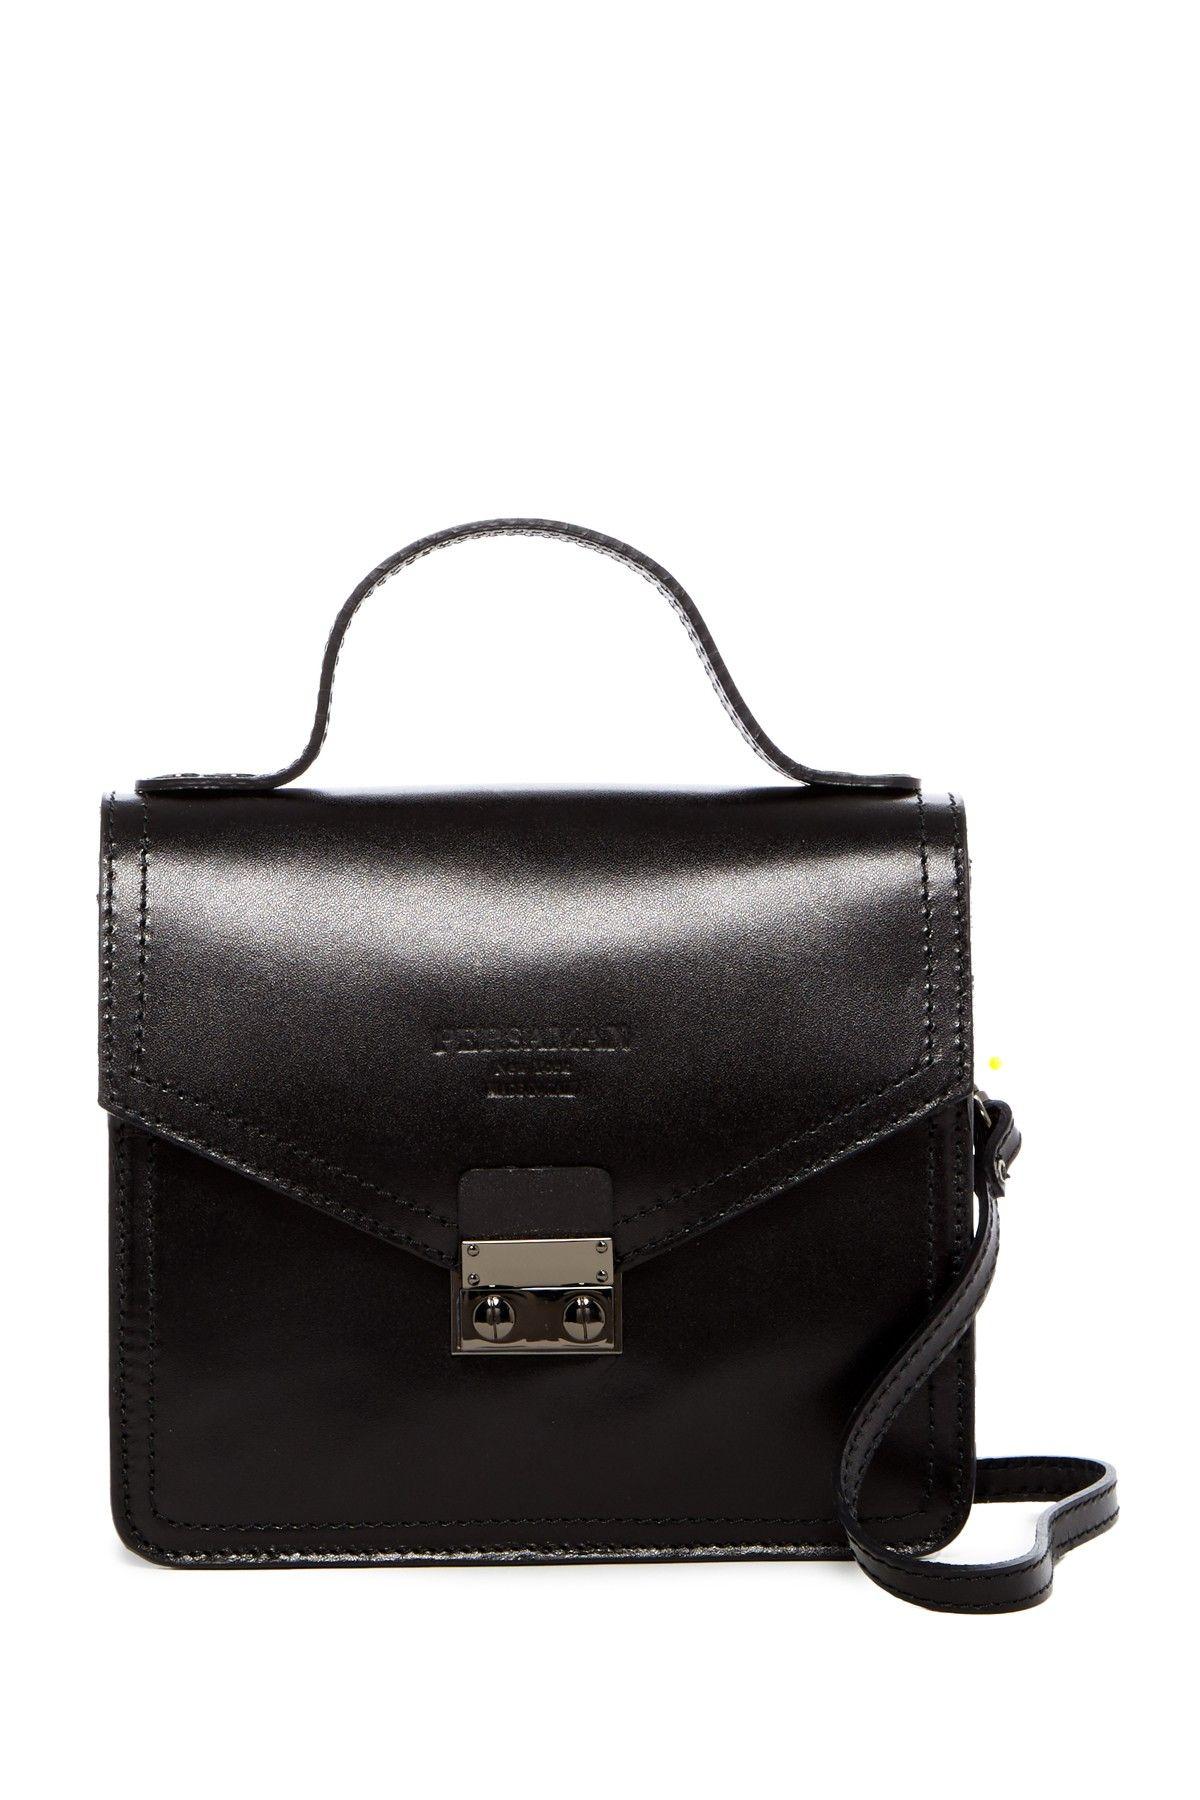 Farah Leather Satchel